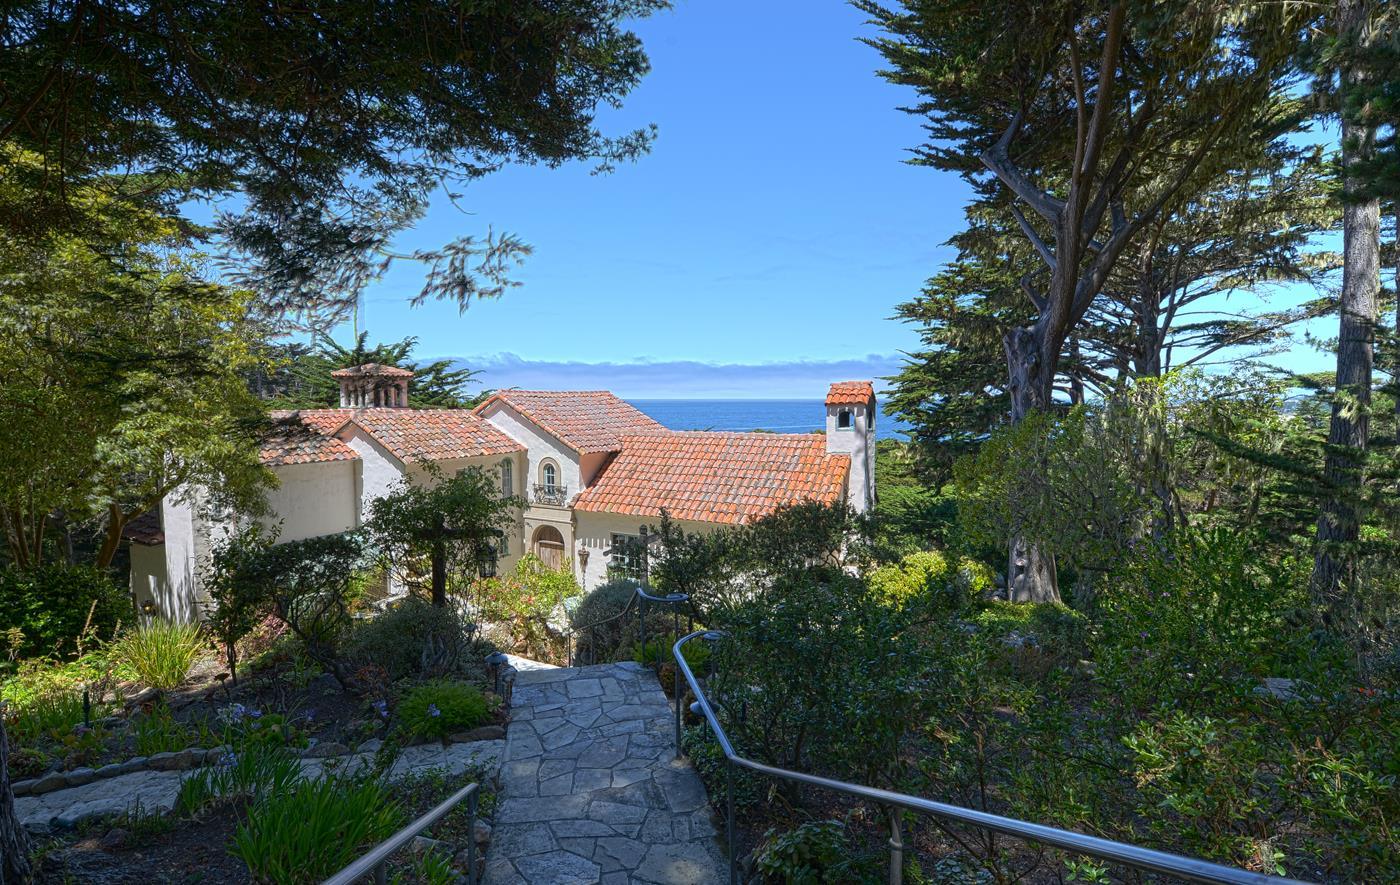 Single Family Home for Sale at 176 Spindrift 176 Spindrift Carmel, California 93923 United States